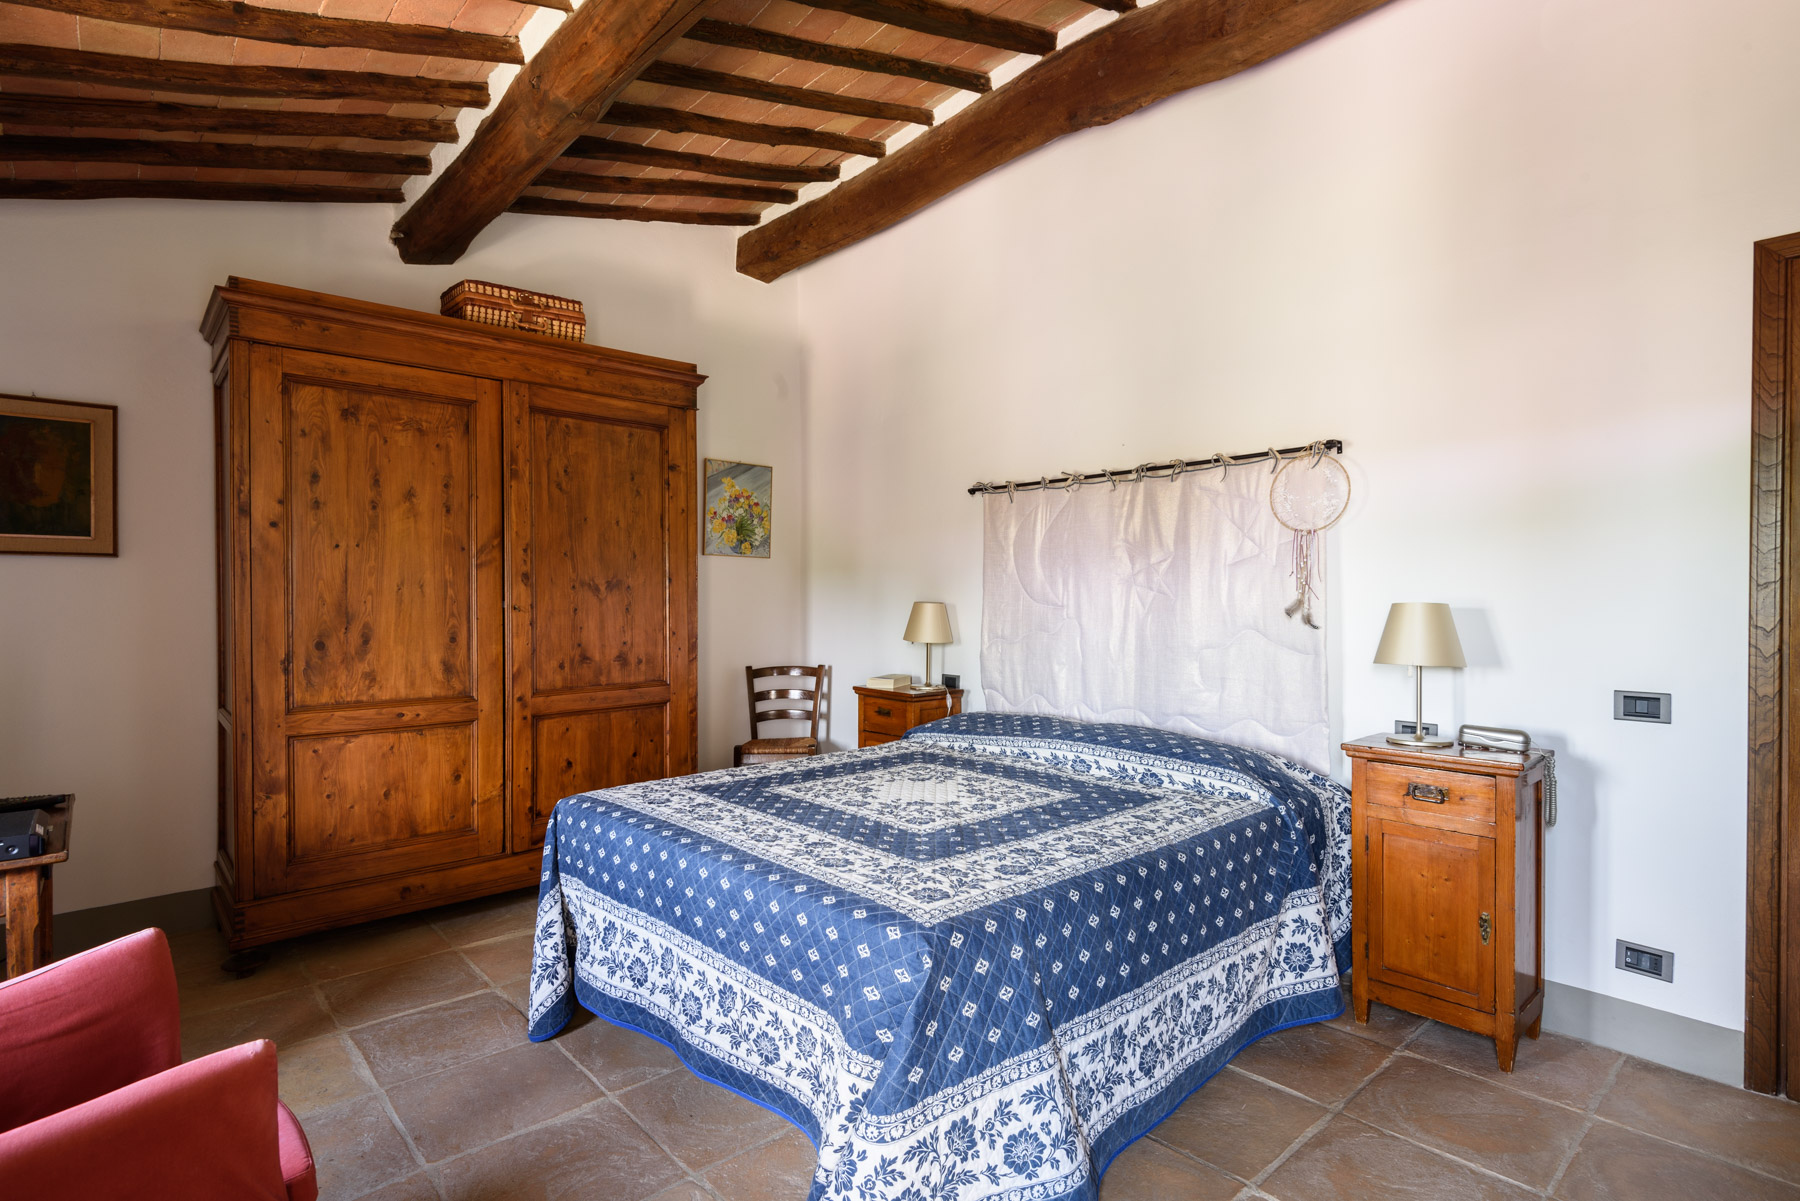 Rustico in Vendita a Castellina In Chianti: 5 locali, 650 mq - Foto 18